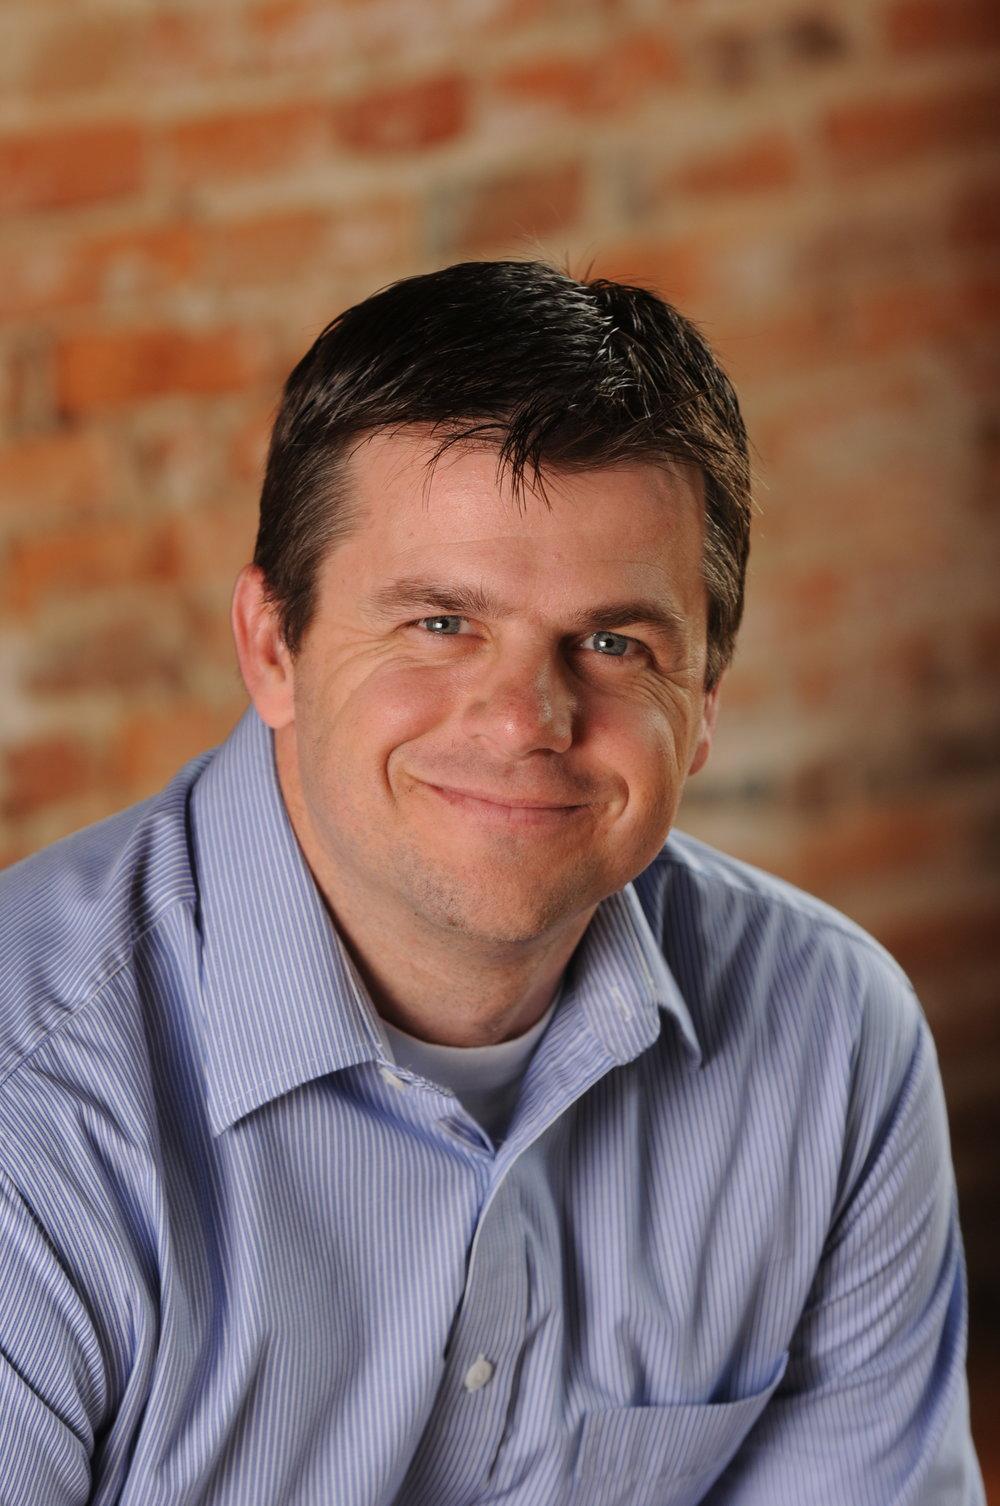 DoApp founding member and CEO Wade Beavers. Photo courtesy of DoApp.